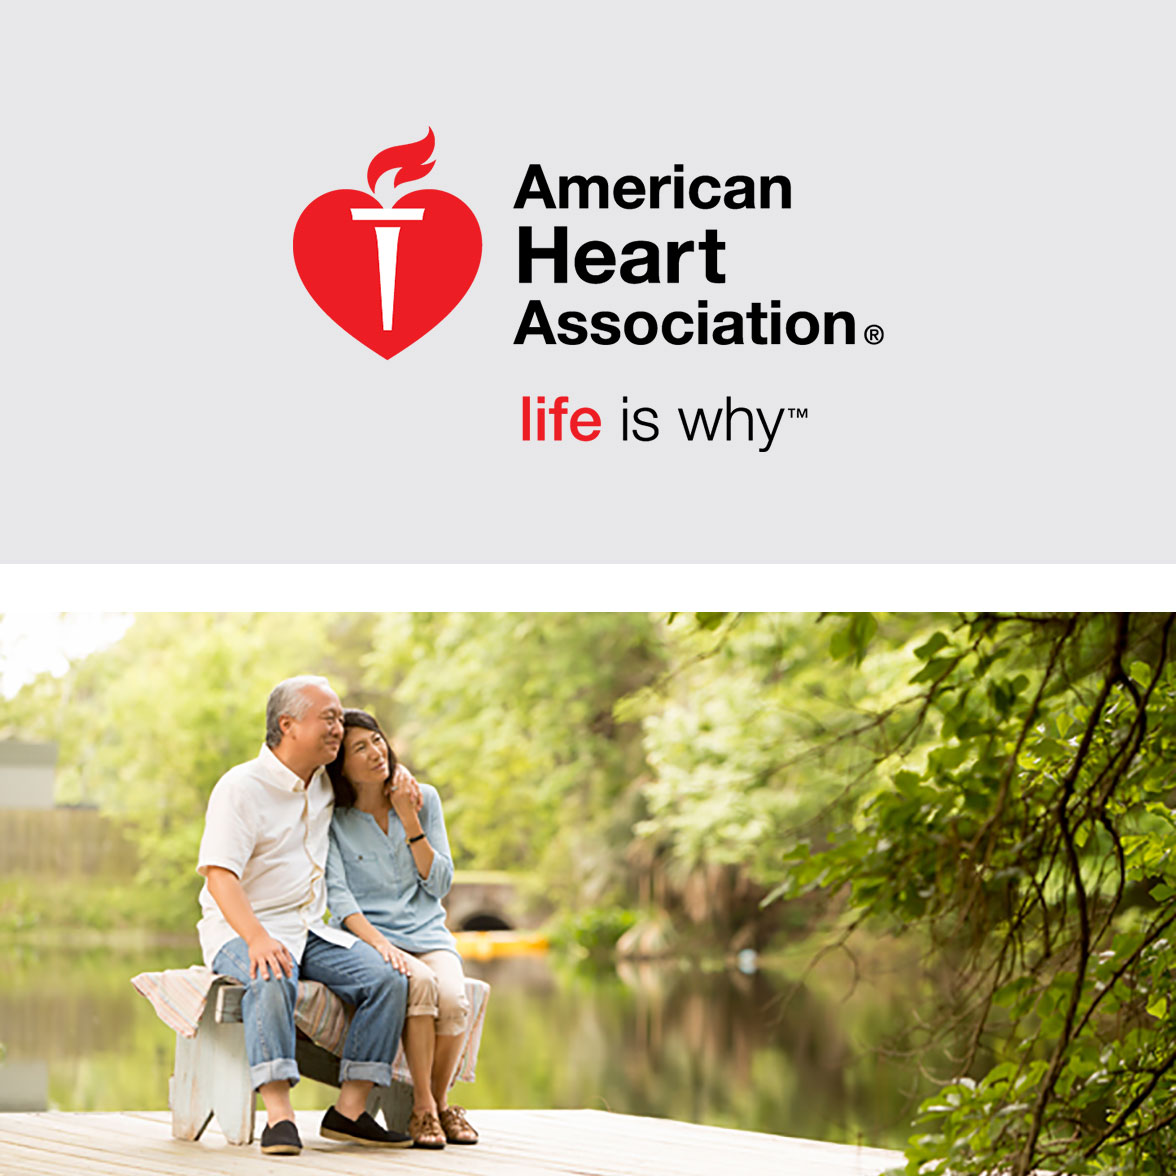 American Heart Association Logo and a couple outside